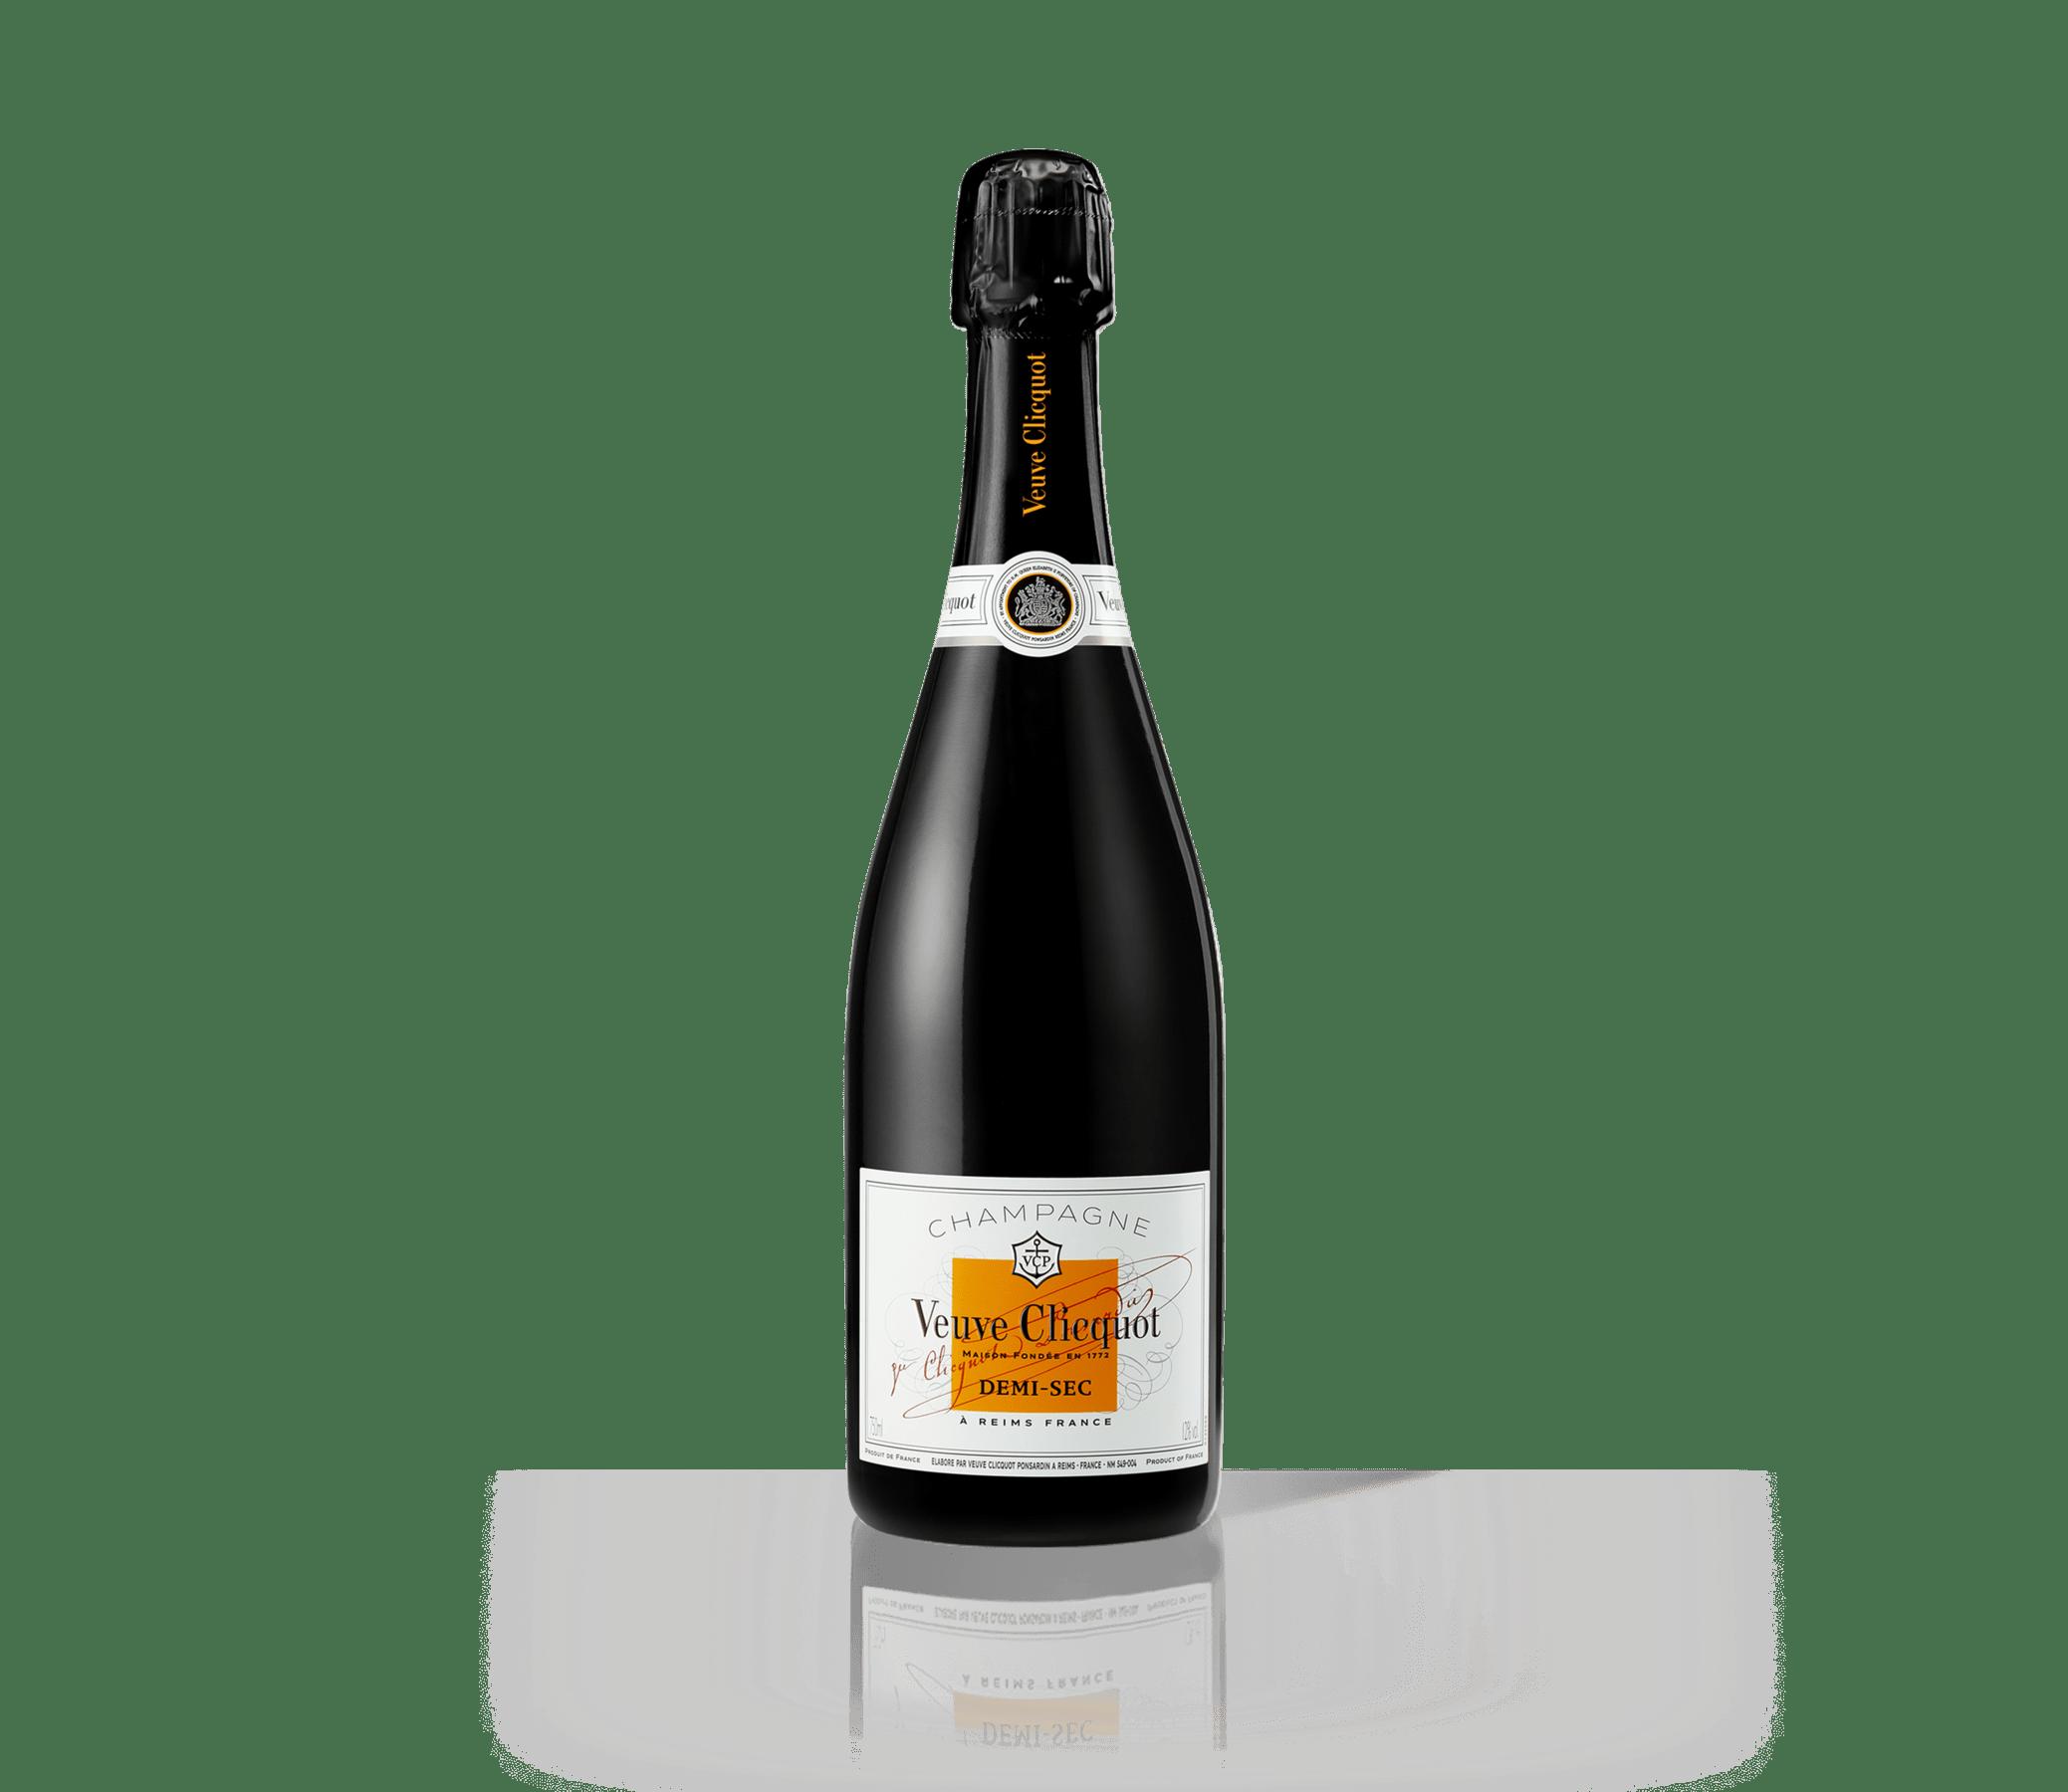 Flasche Veuve-Clicquot-Champagner Demi-Sec